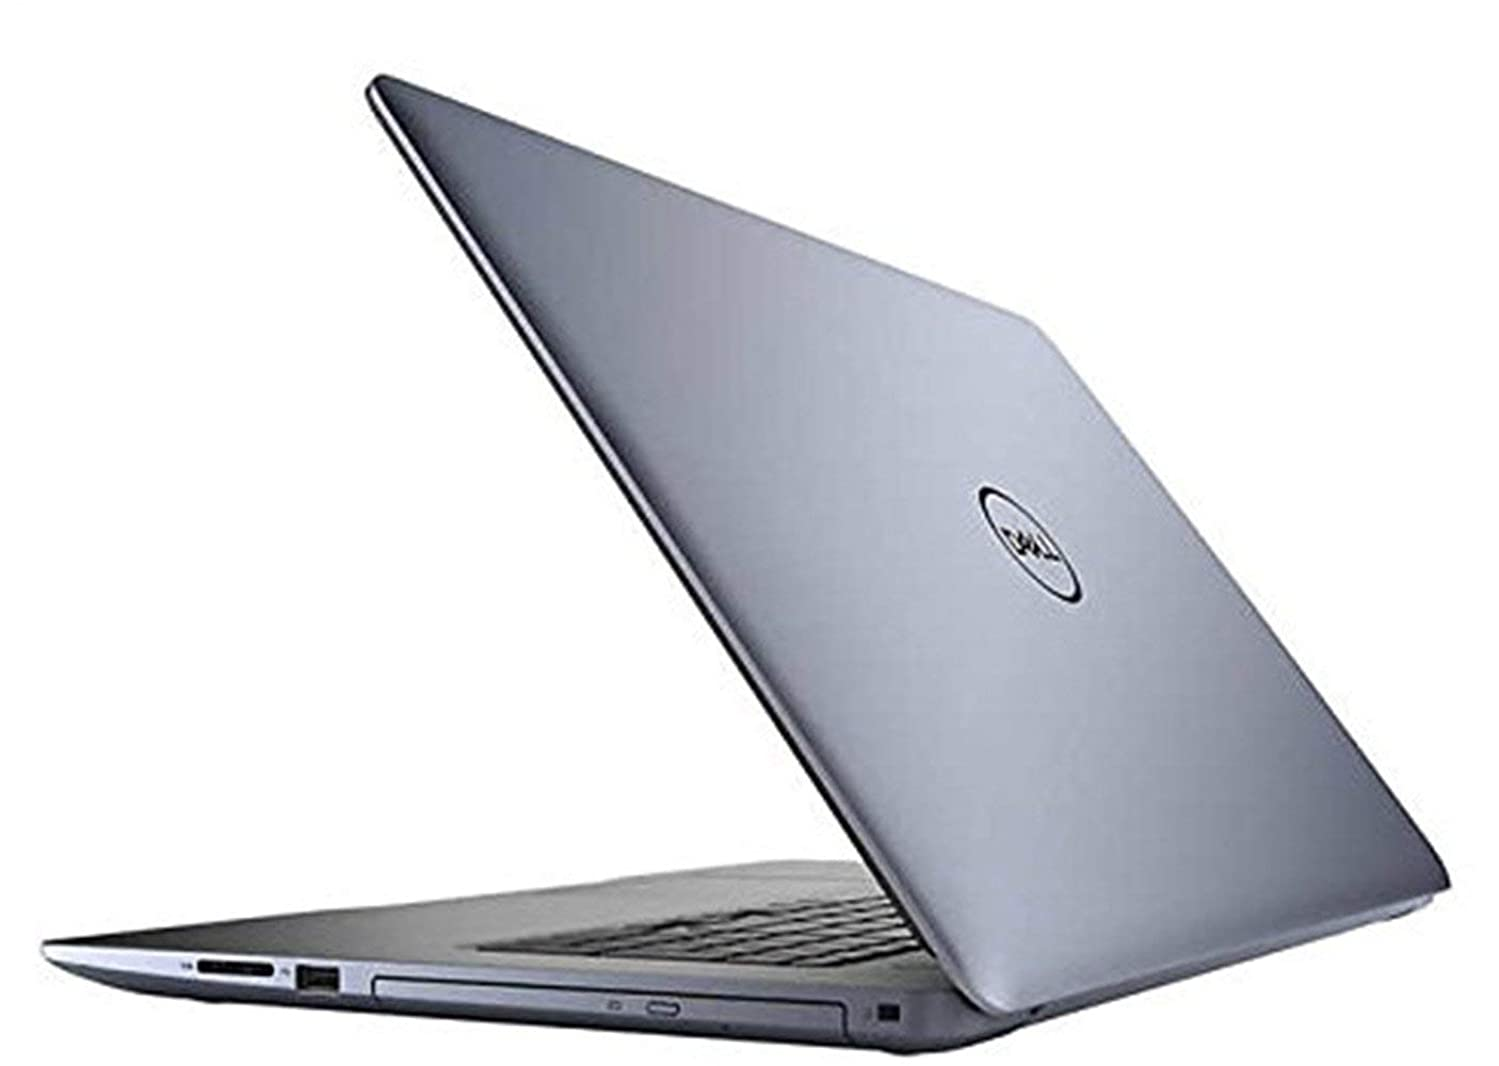 Dell Inspiron?15 5000, 15.6 inch FHD Touchscreen Inspiron Laptop Computer, Dell Laptop i5-8250U Intel 4-Core, 4GB RAM, 1TB HDD, WiFi DVD Bluetooth 4.2 Backlit Keyboard MAXXAUDIO Win 10